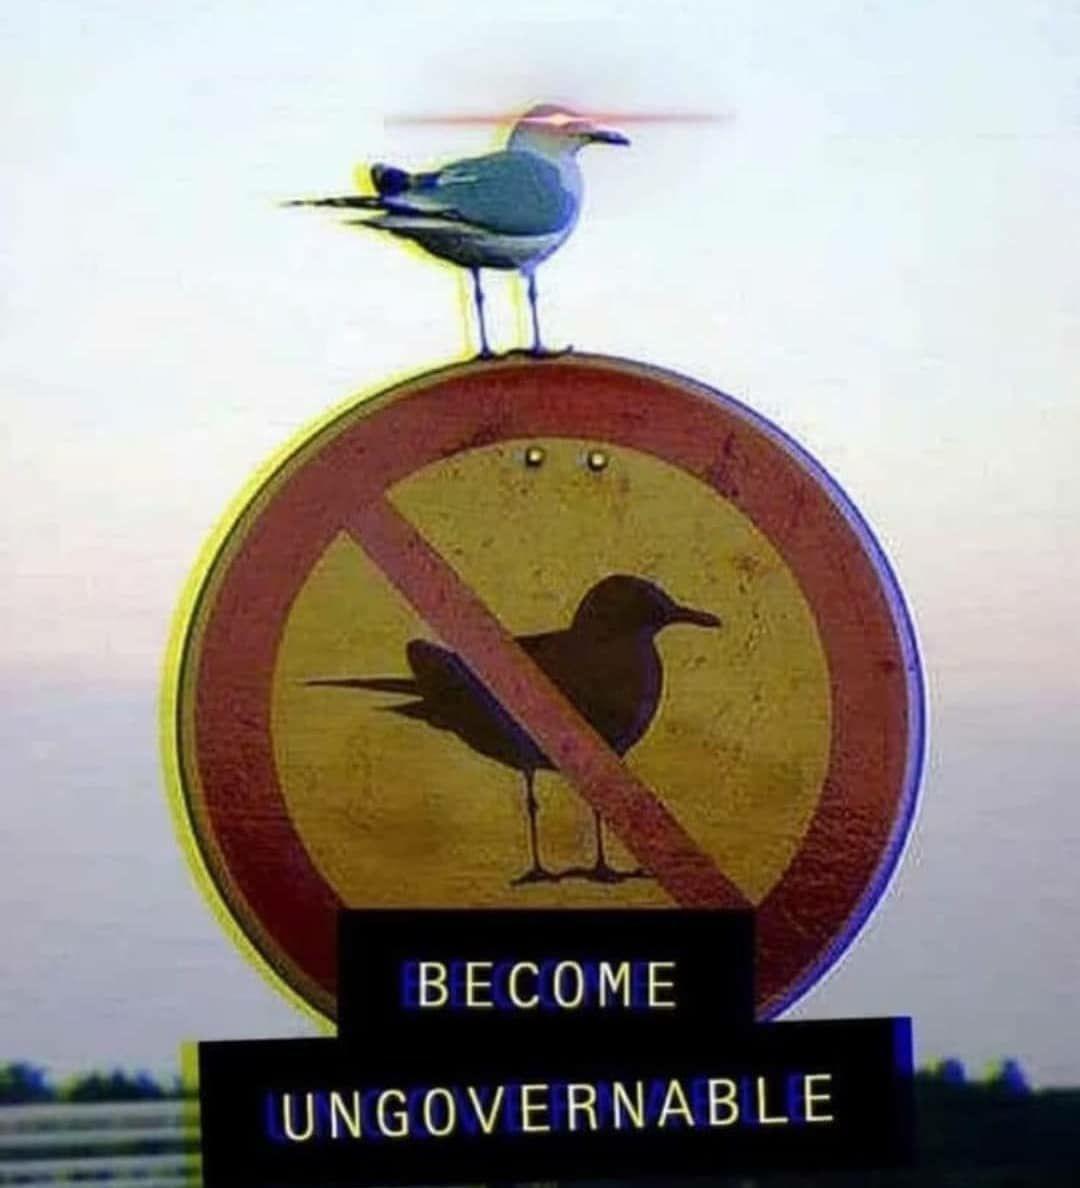 Ungovernable - meme